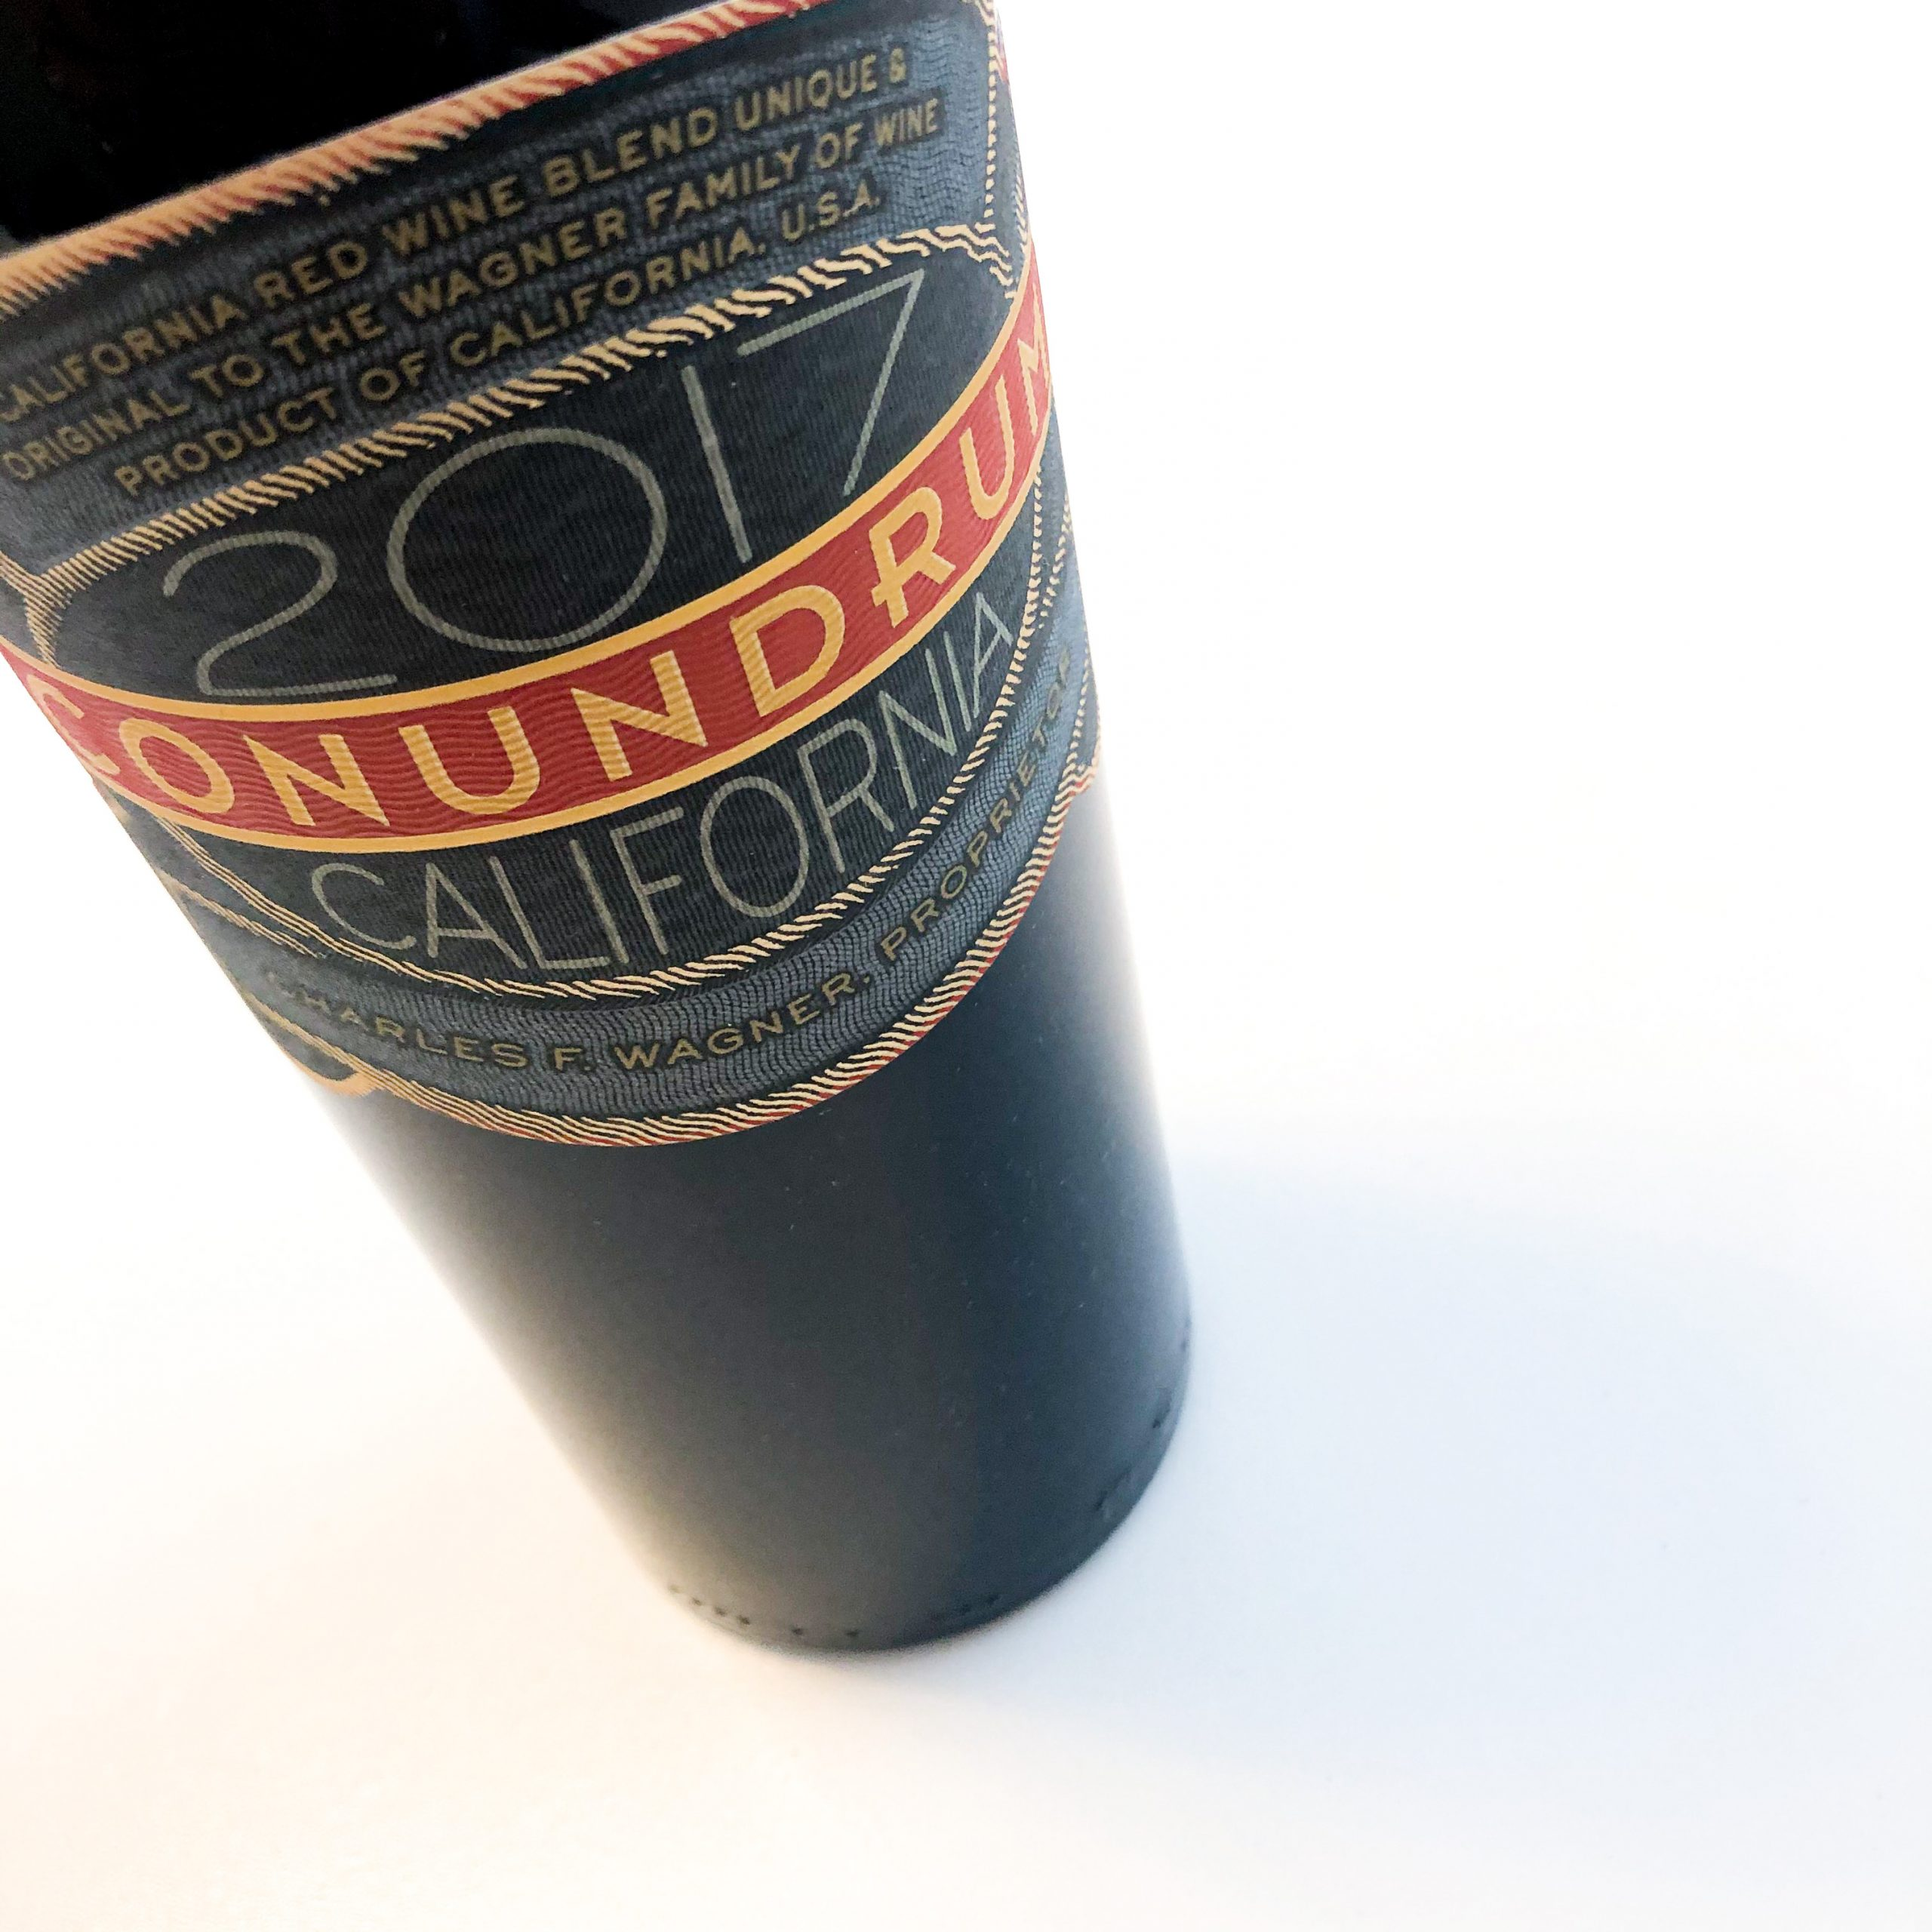 Special Wines Under